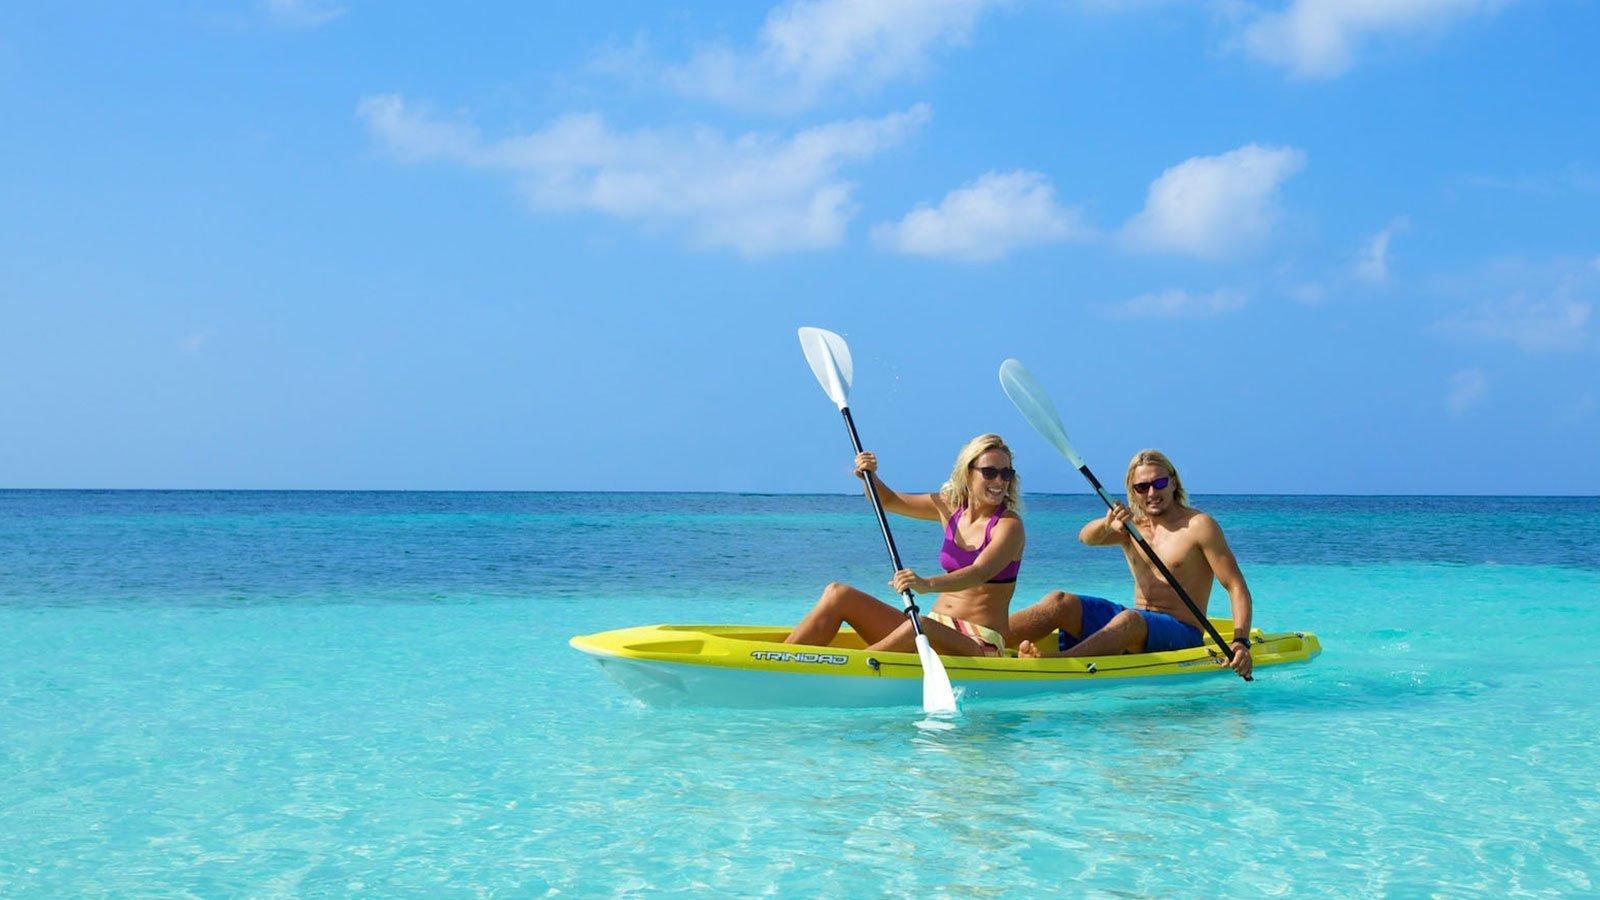 Canoe Kuredu Maldives